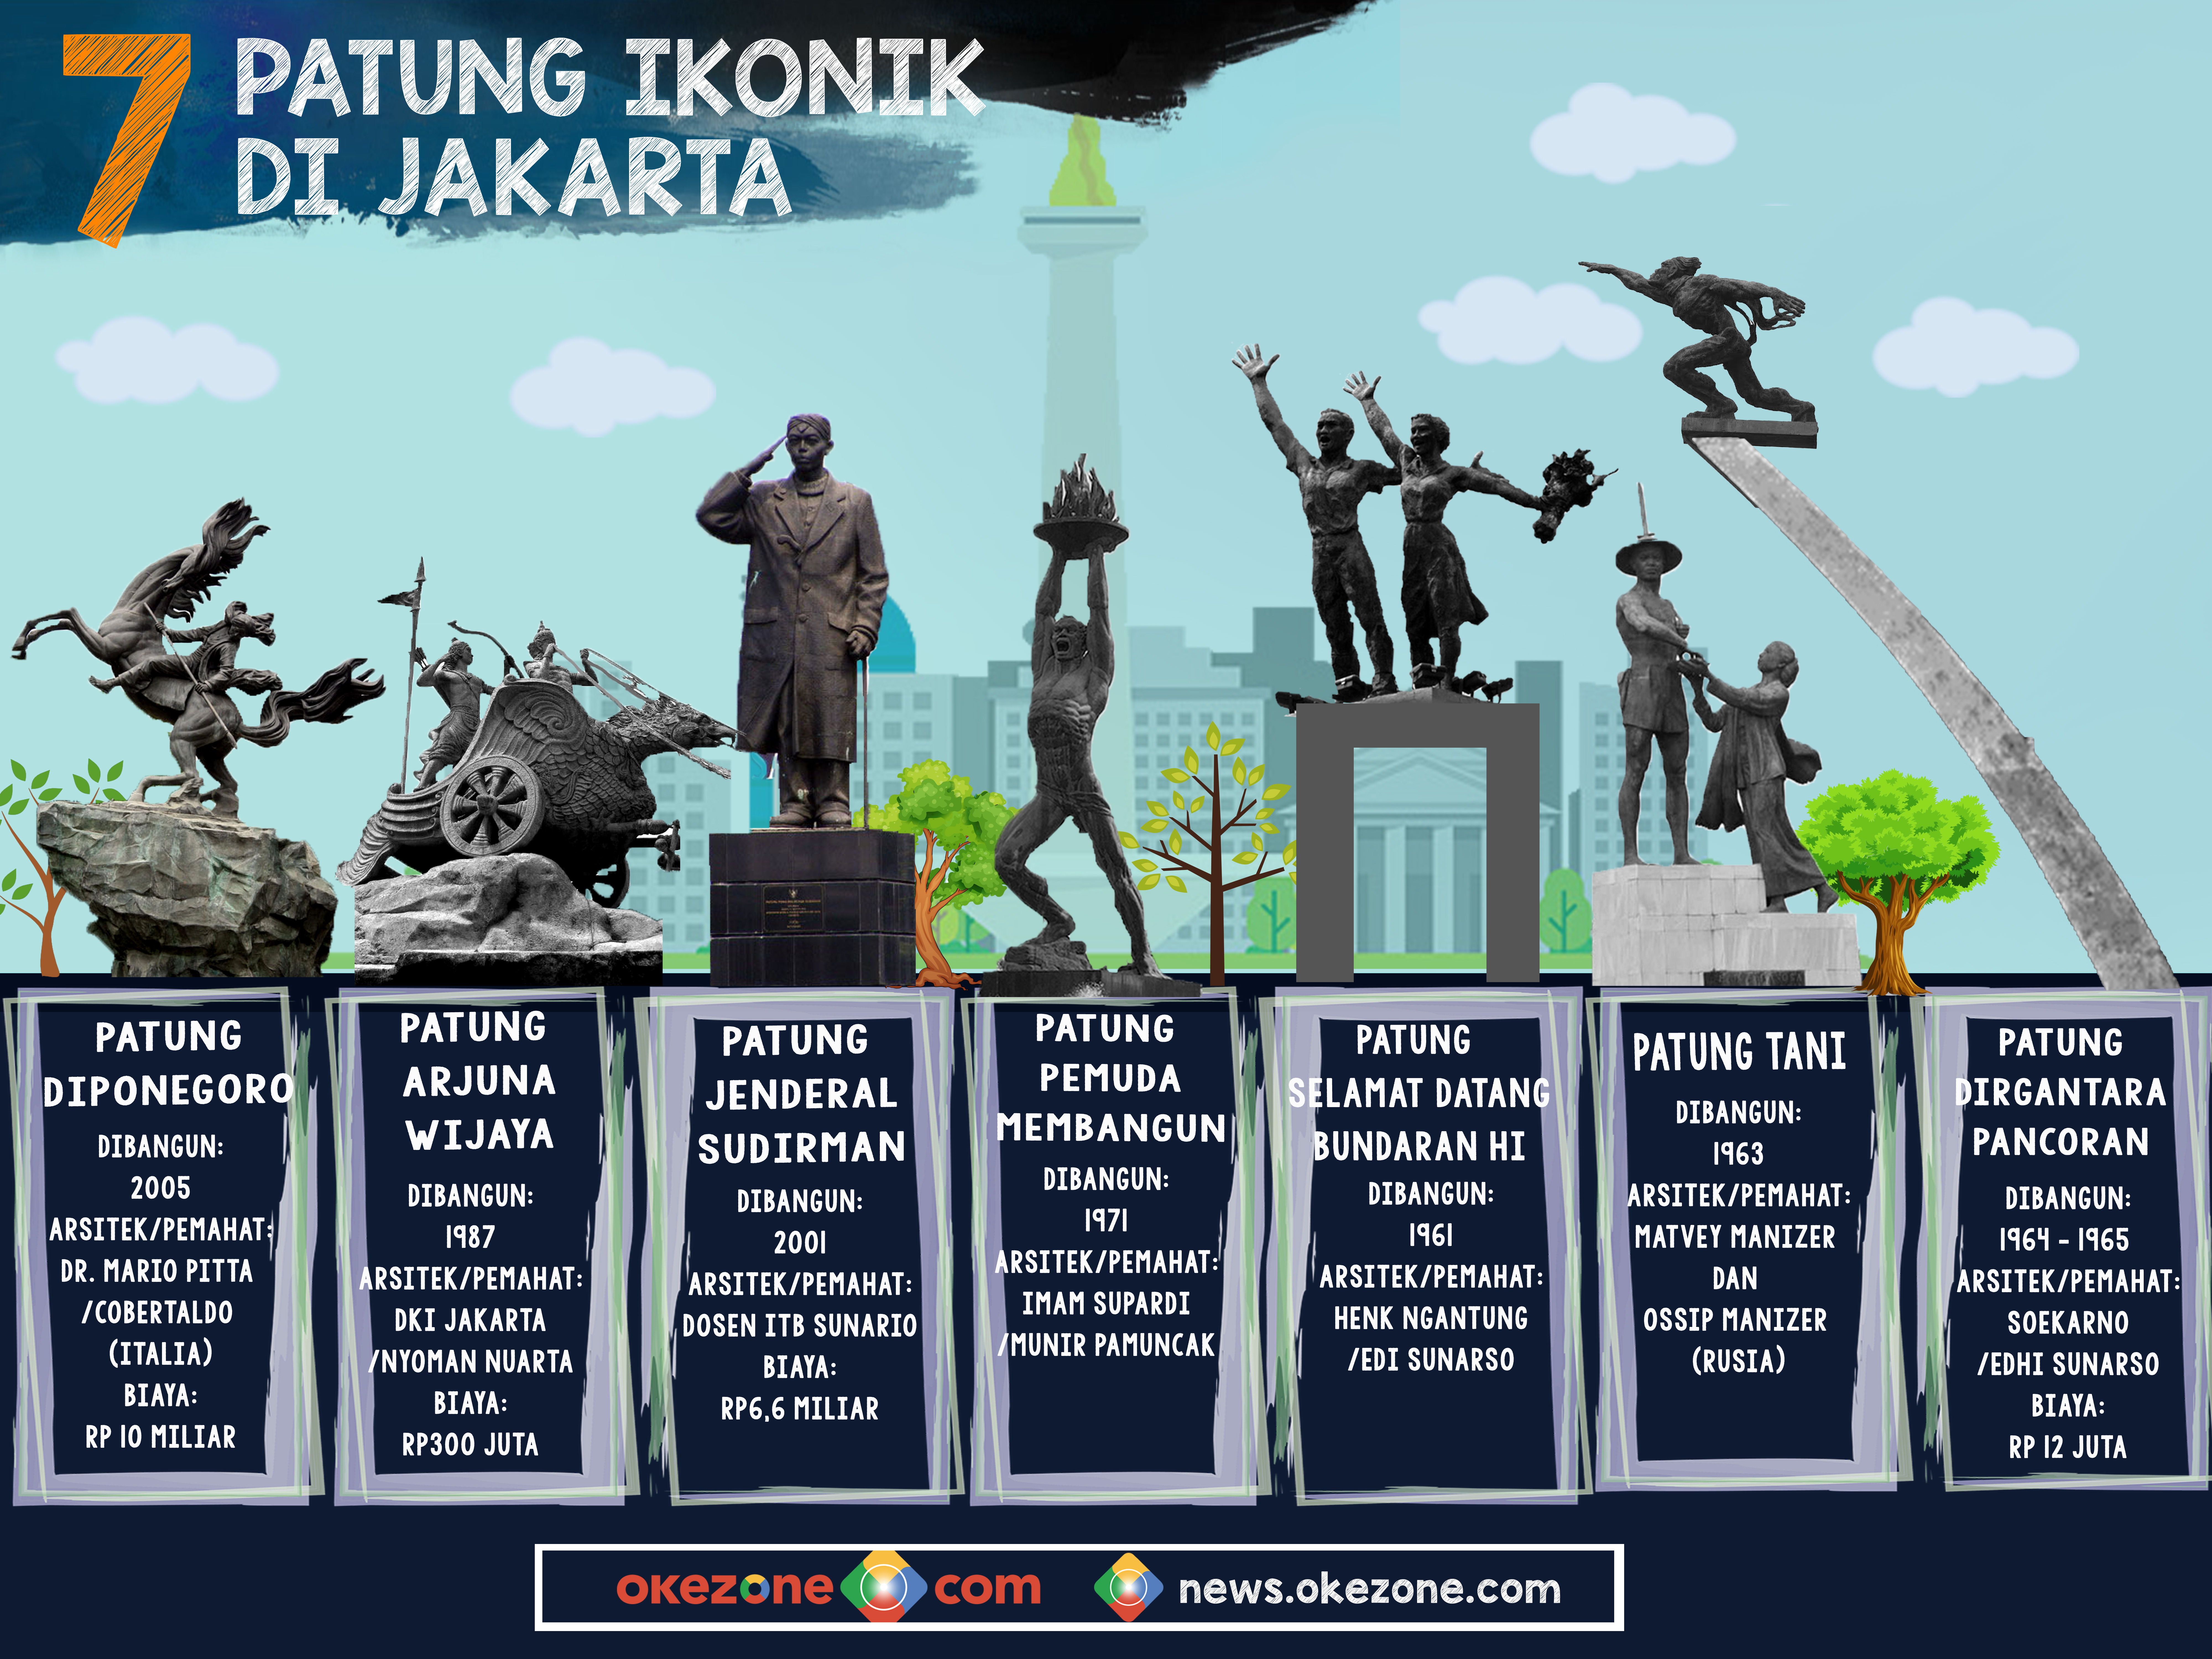 7 PATUNG IKONIK DI JAKARTA -